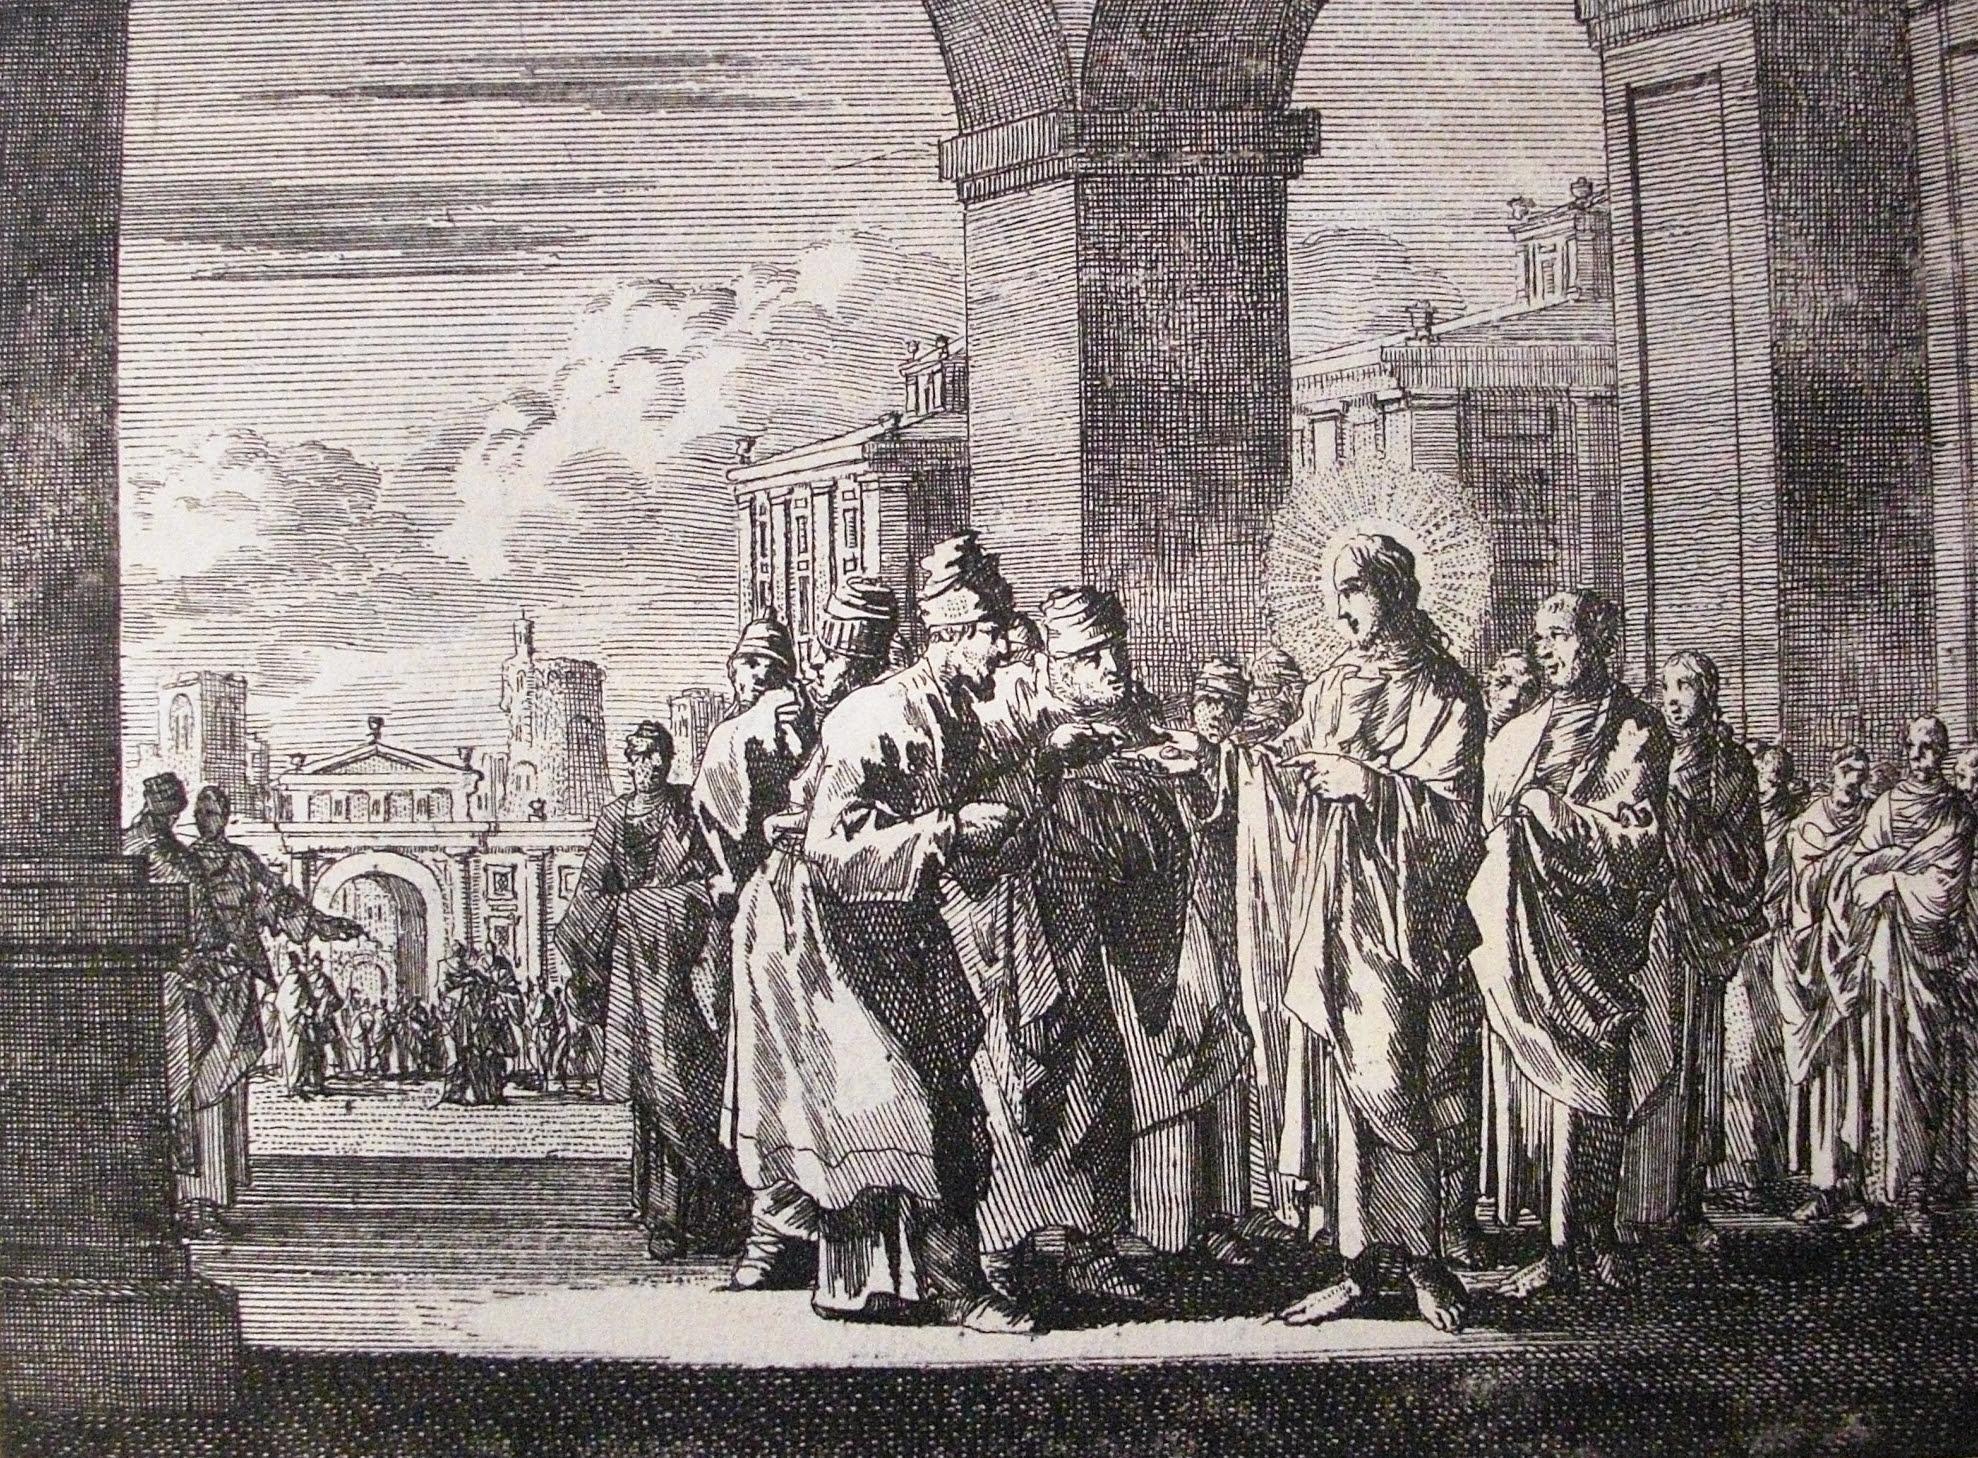 Jesus disputes the Pharasees